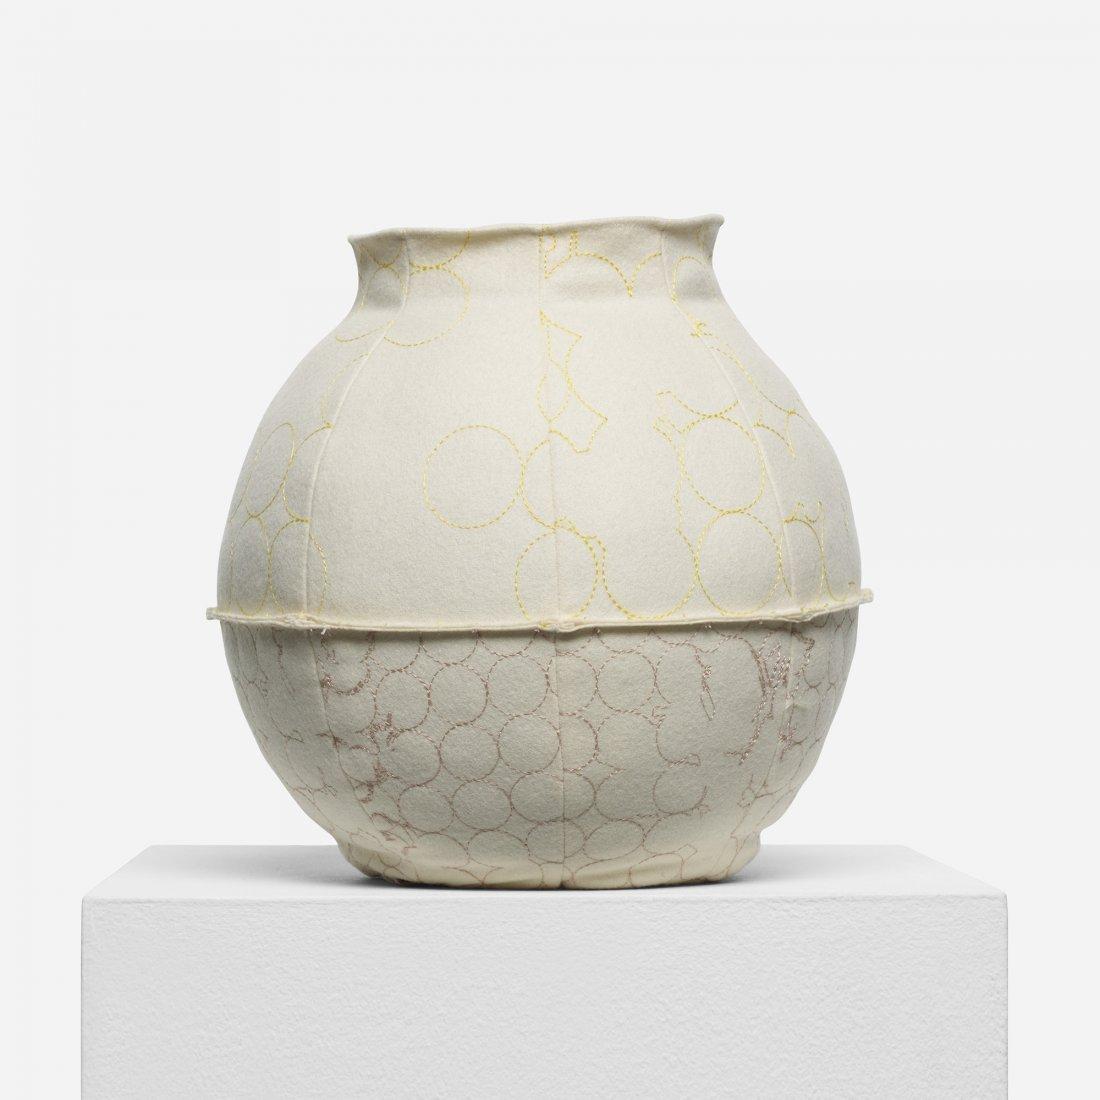 Hella Jongerius Quilted vase